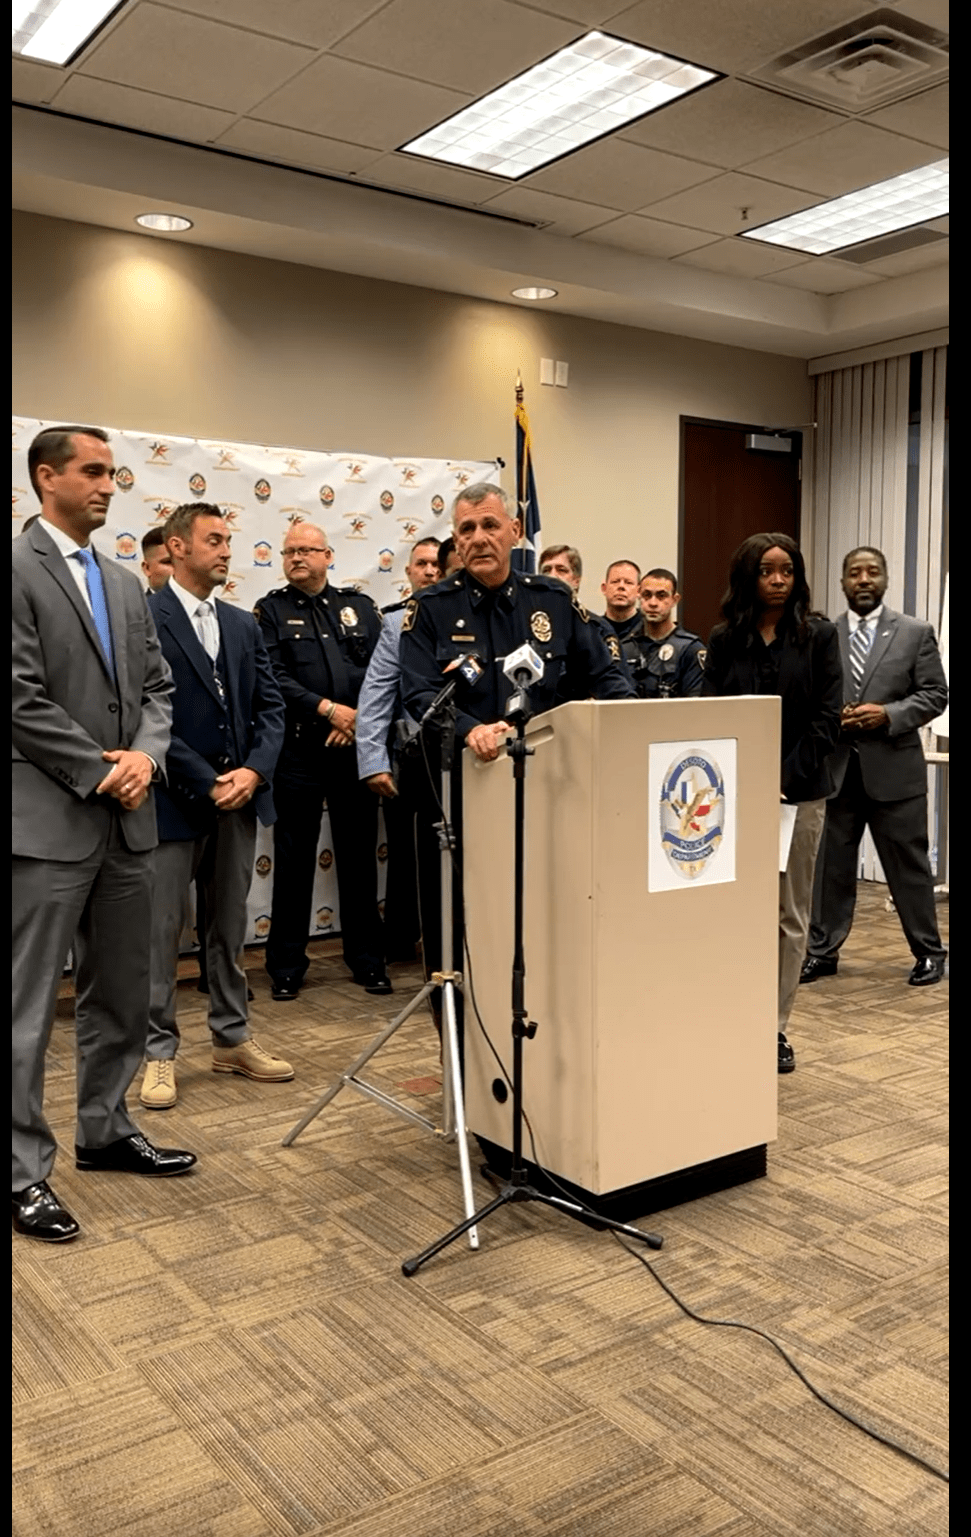 DeSoto Police at press conference podium